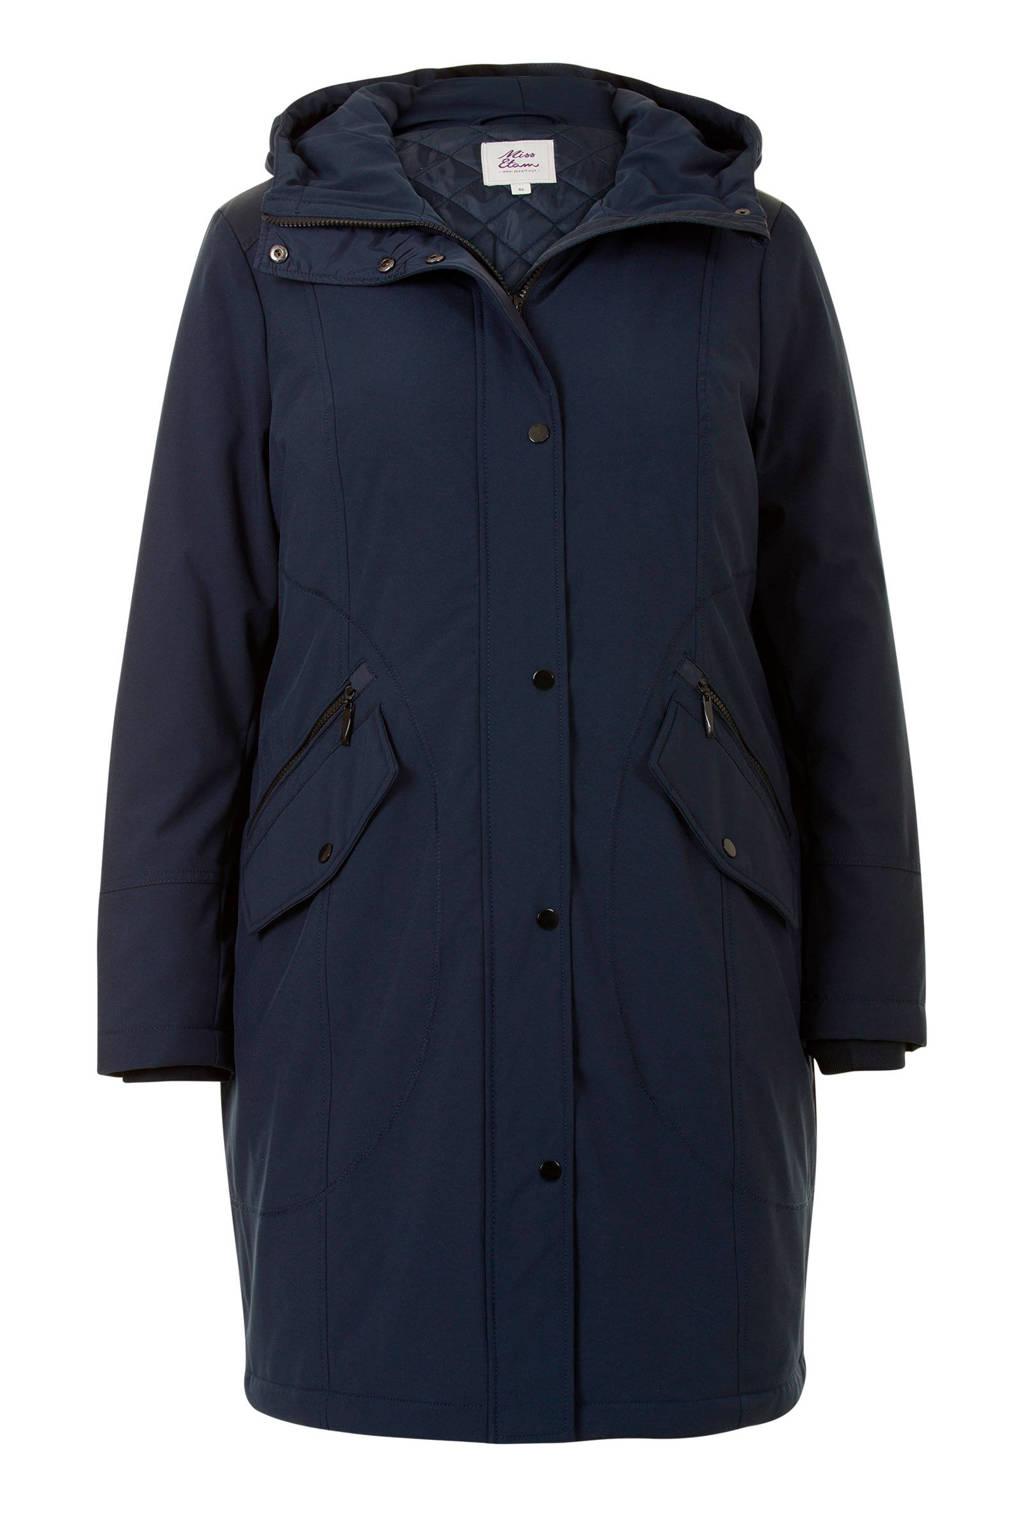 Miss Etam Plus lange jas donkerblauw, Donkerblauw